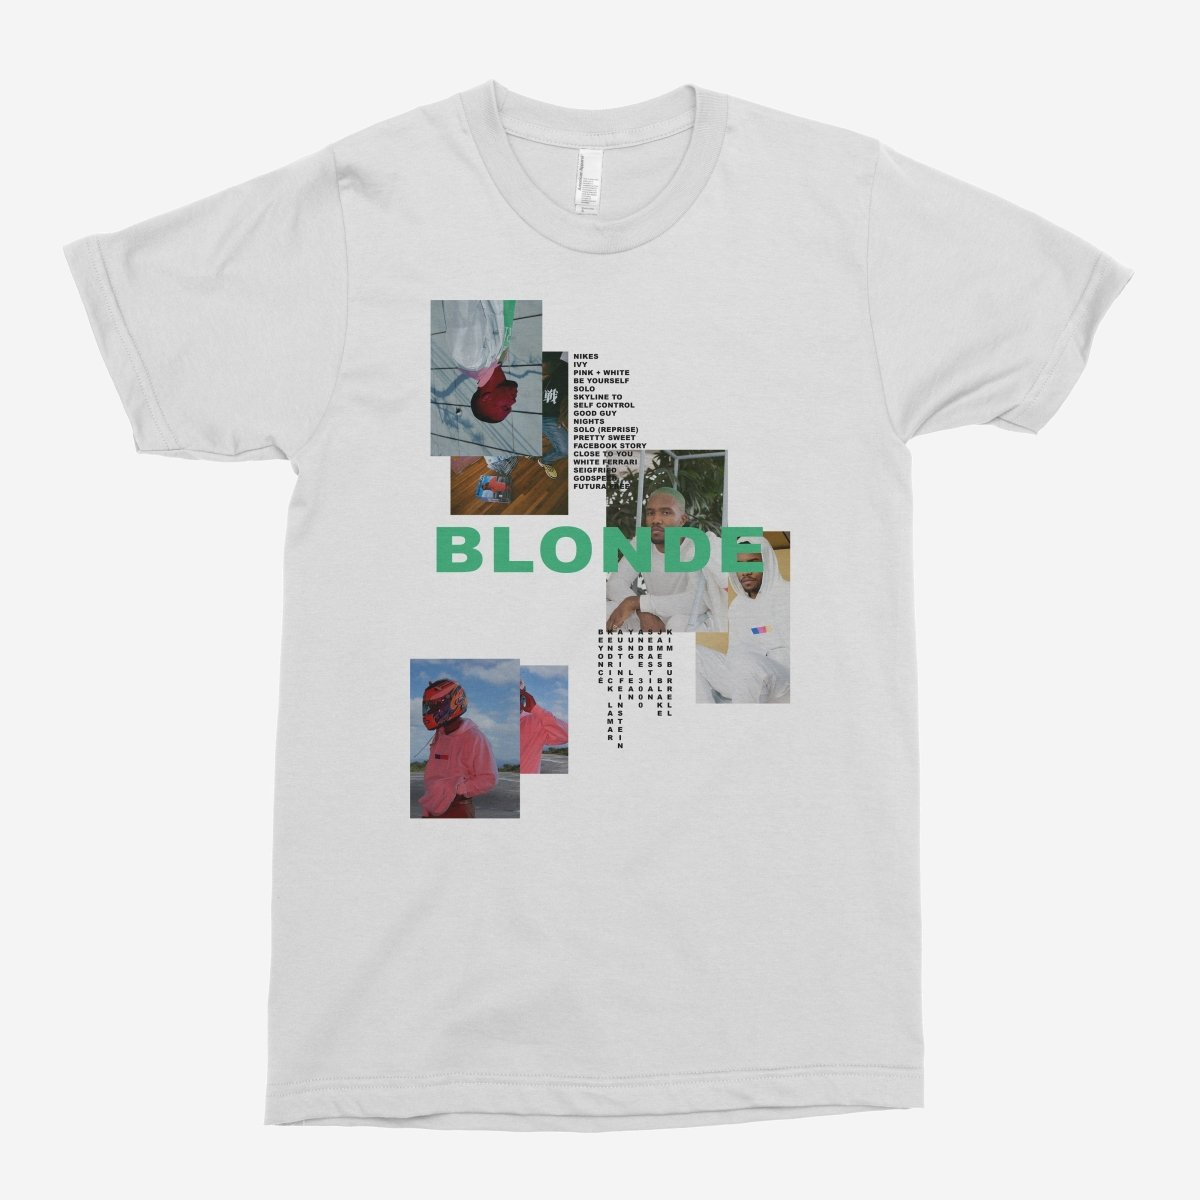 Frank Ocean - Blonde Mismatch Unisex T-Shirt